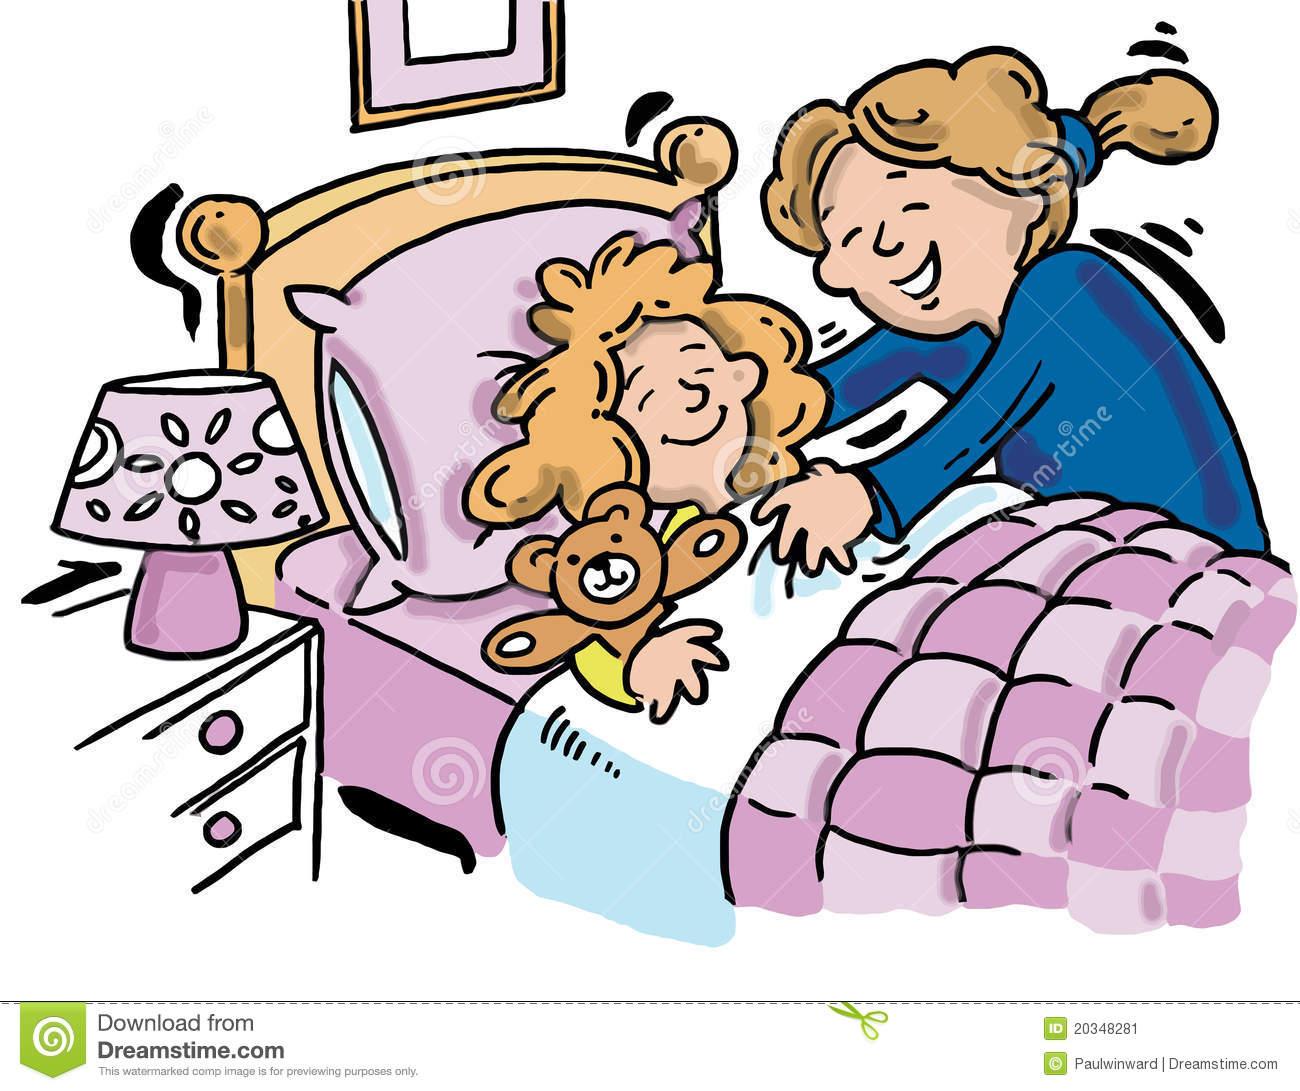 Bedtime Story Clip Art-Bedtime Story Clip Art-14